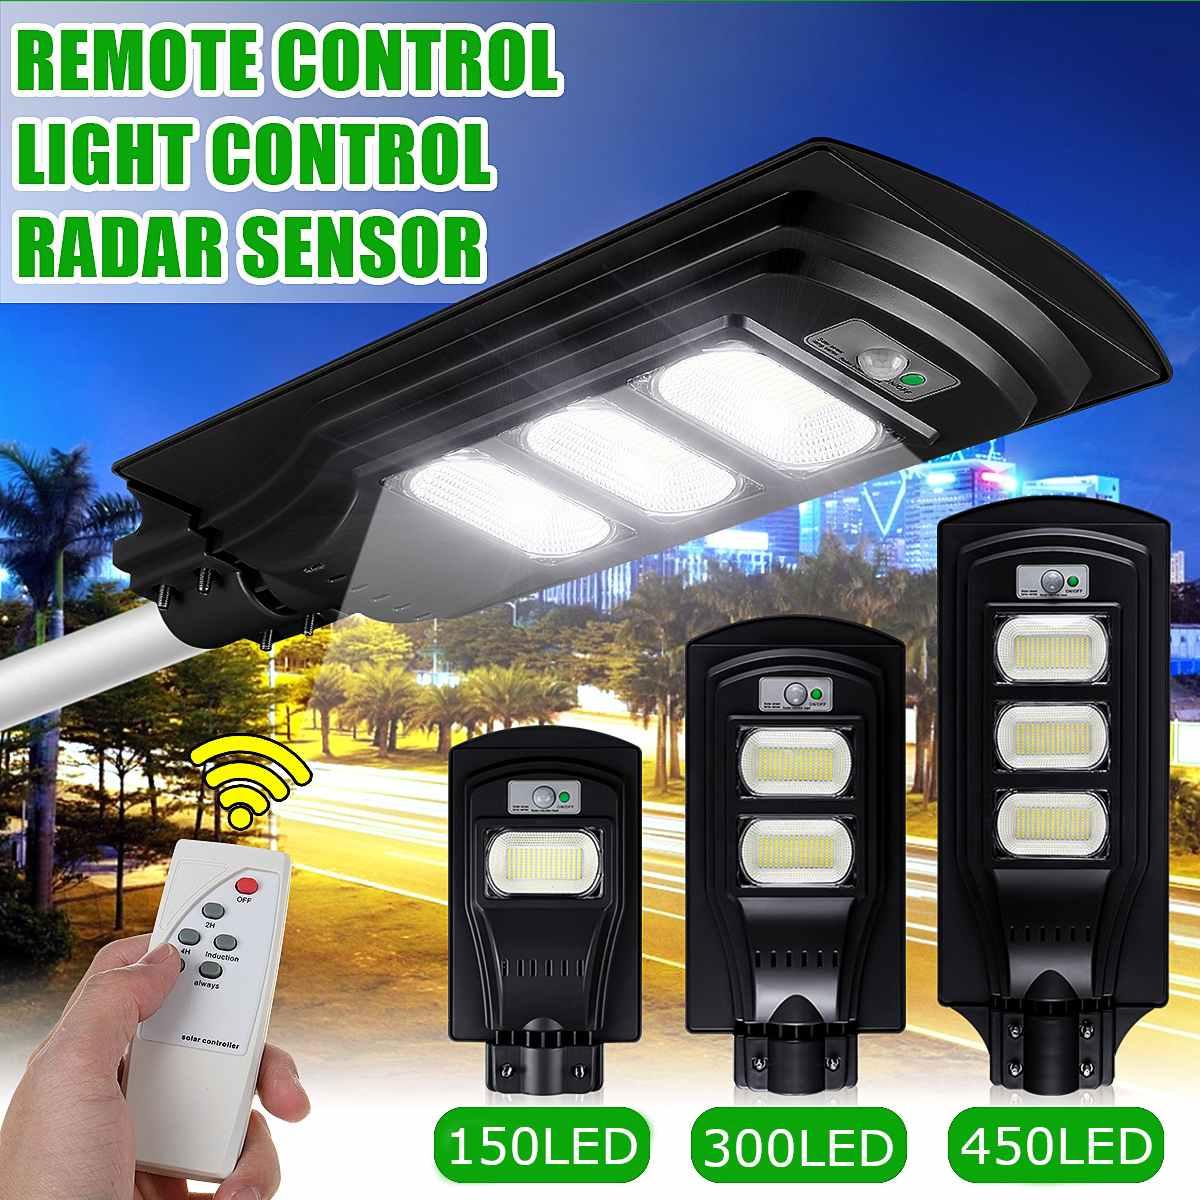 50W 100W 150W LED Solar Street Light Timing Control+PIR Motion Sensor Outdoor Wall Lamp With Remote Control 6V Solar Power